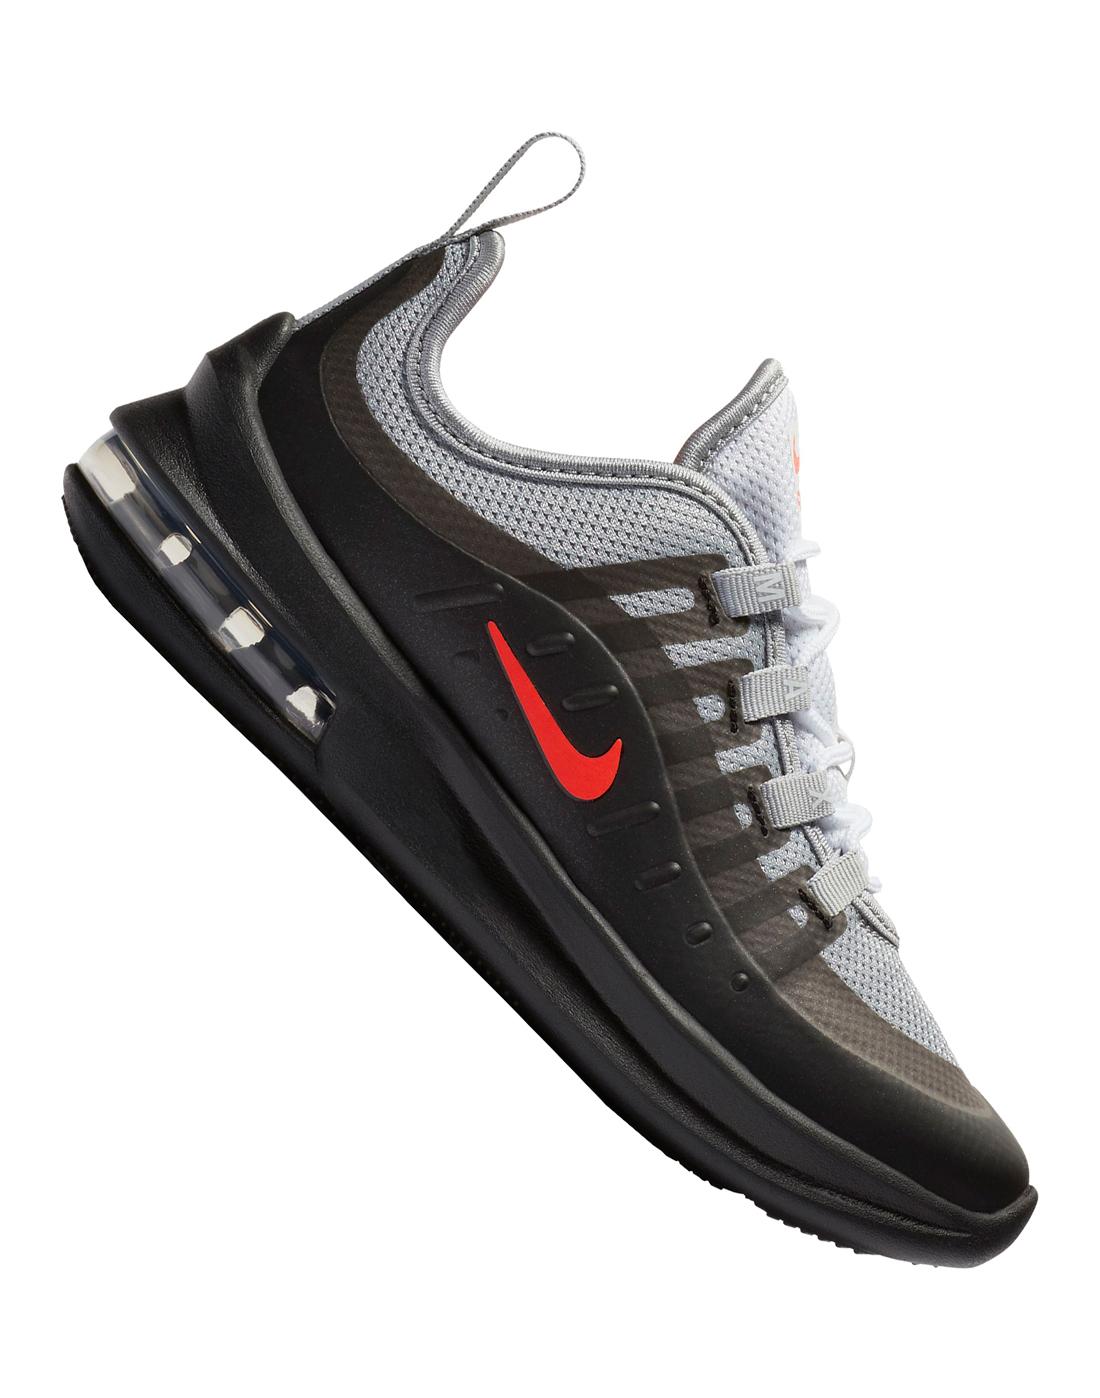 55c4b796c8568 Young Boys Nike Air Max Axis